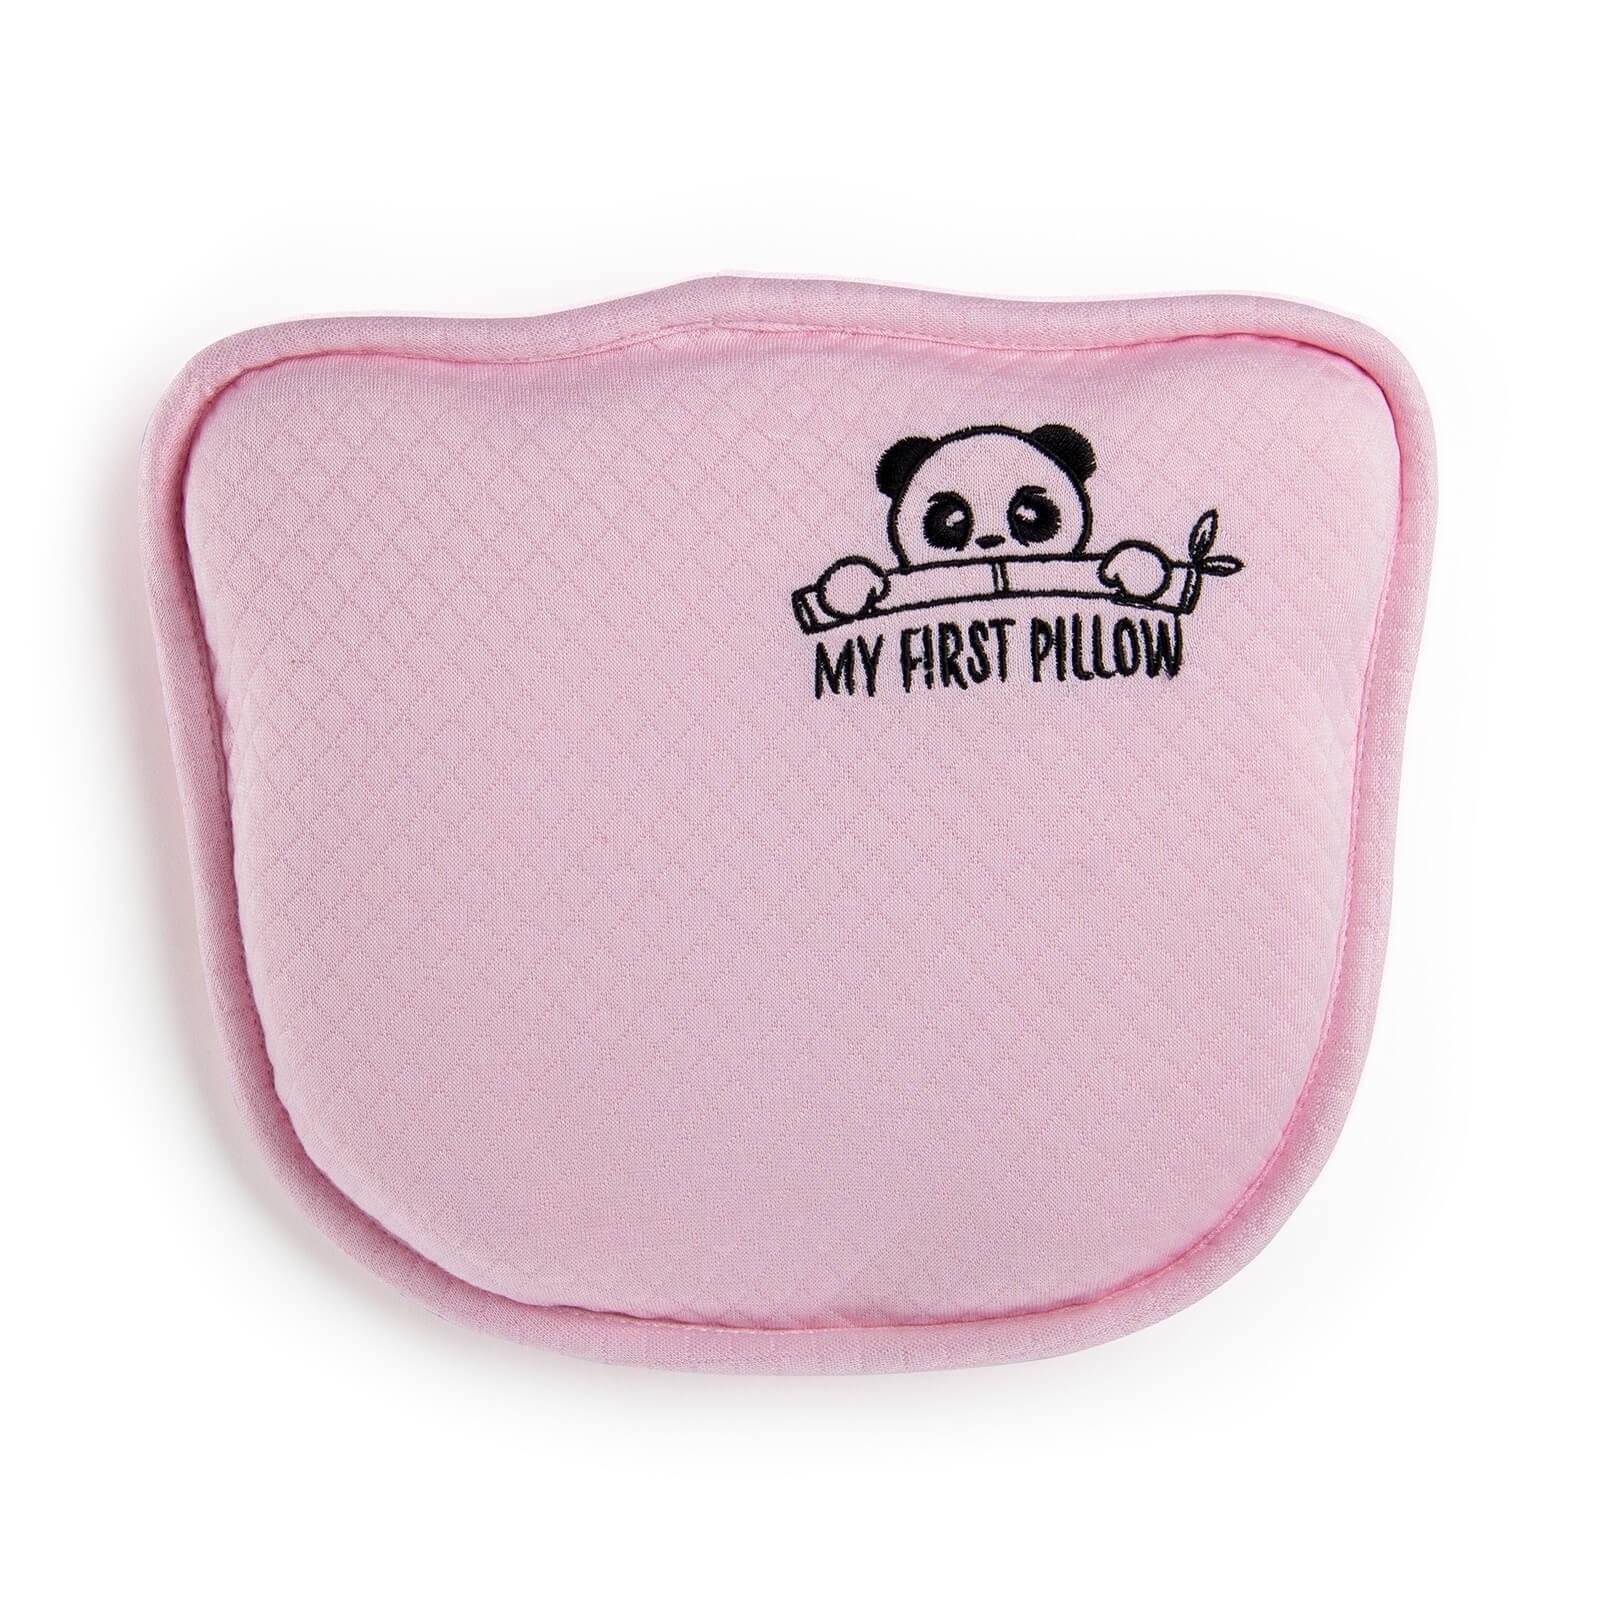 Dječji jastuk MY FIRST PILLOW – roza